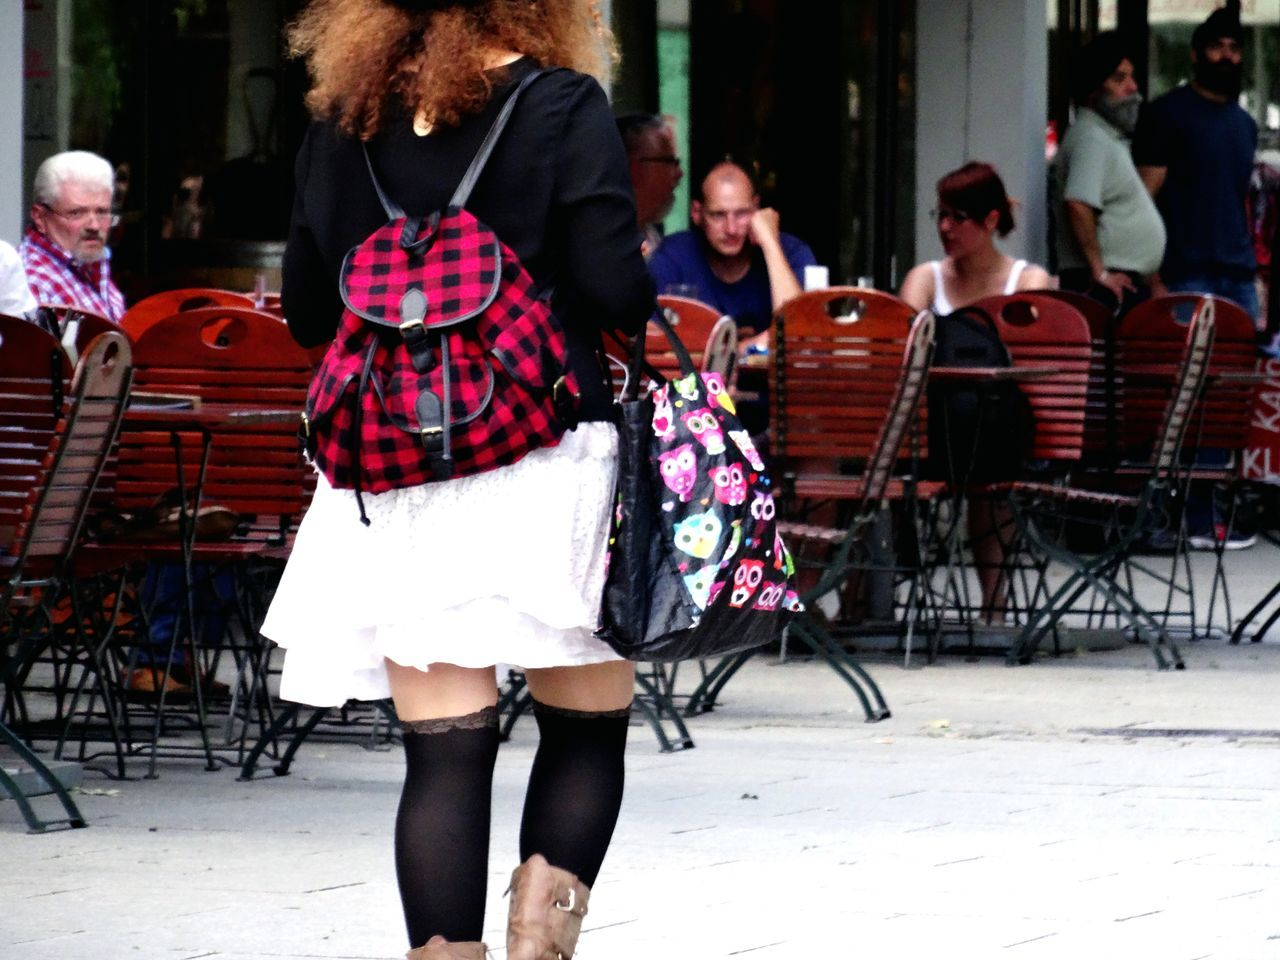 Streat wear. The Street Photographer - 2015 EyeEm Awards The Fashionist - 2015 EyeEm Awards EEA3 EEA3 - Dresden EyeEm Best Shots Streetphotography TwentySomething Buffalo Soldier Capturing Freedom